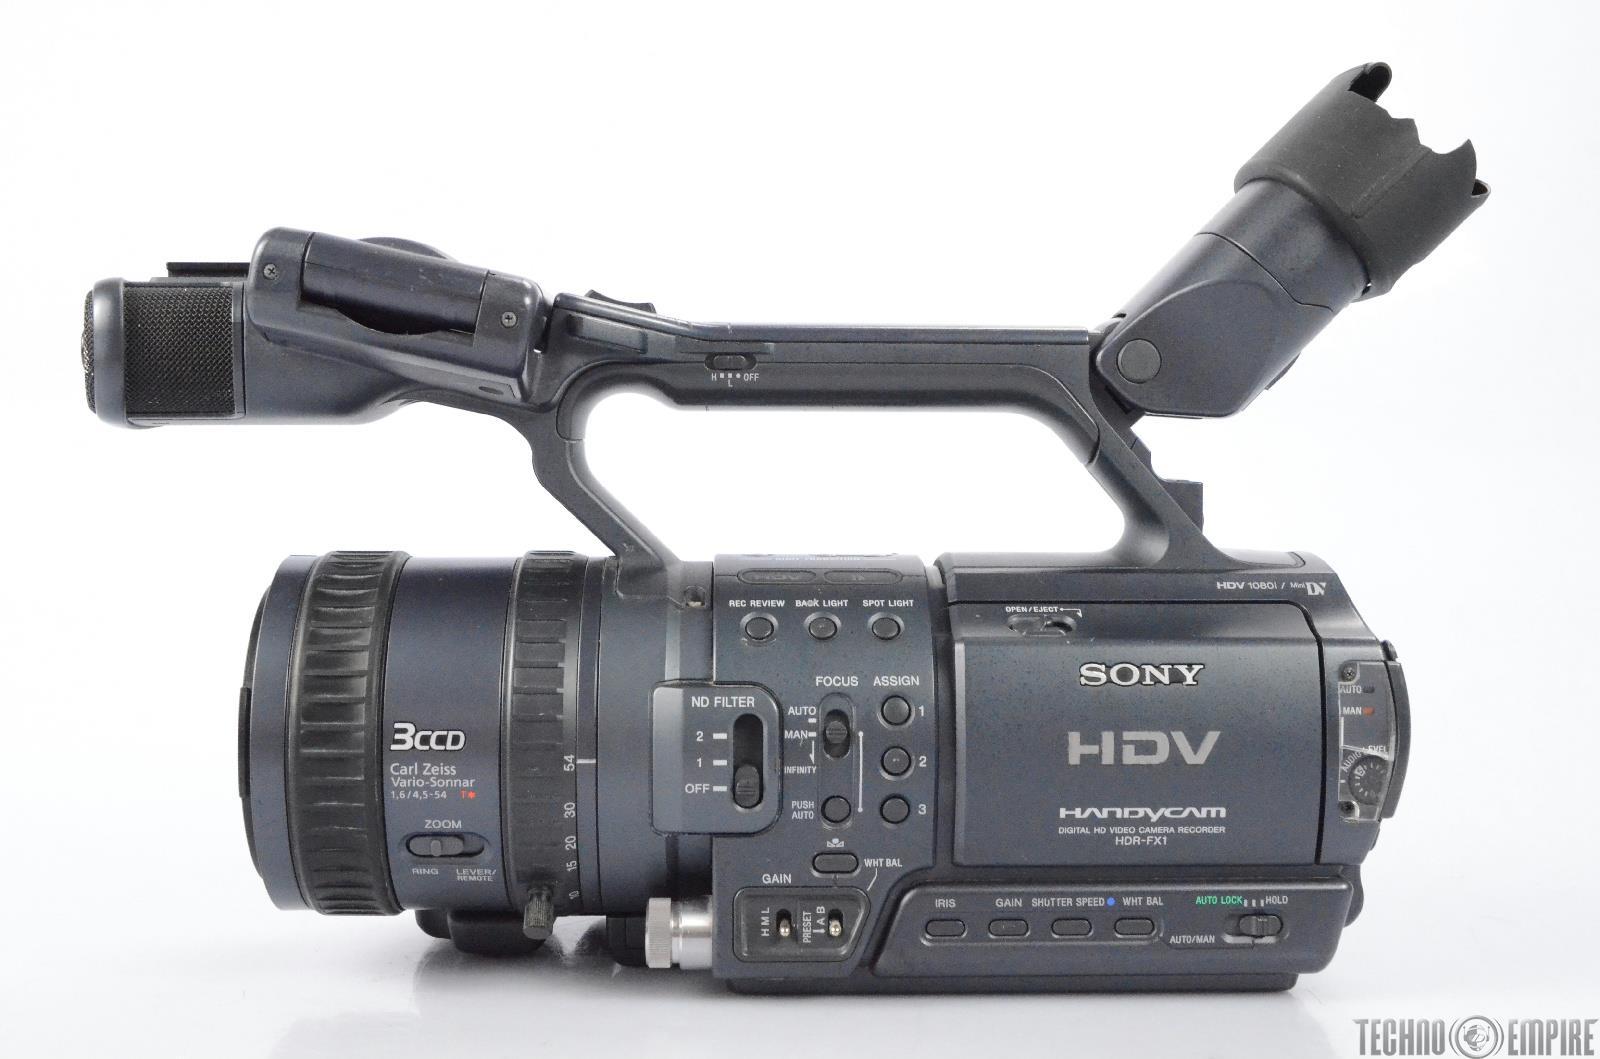 Sony HDR-FX1 HDV Handycam Digital HD Video Camera Recorder NEEDS REPAIR #29530